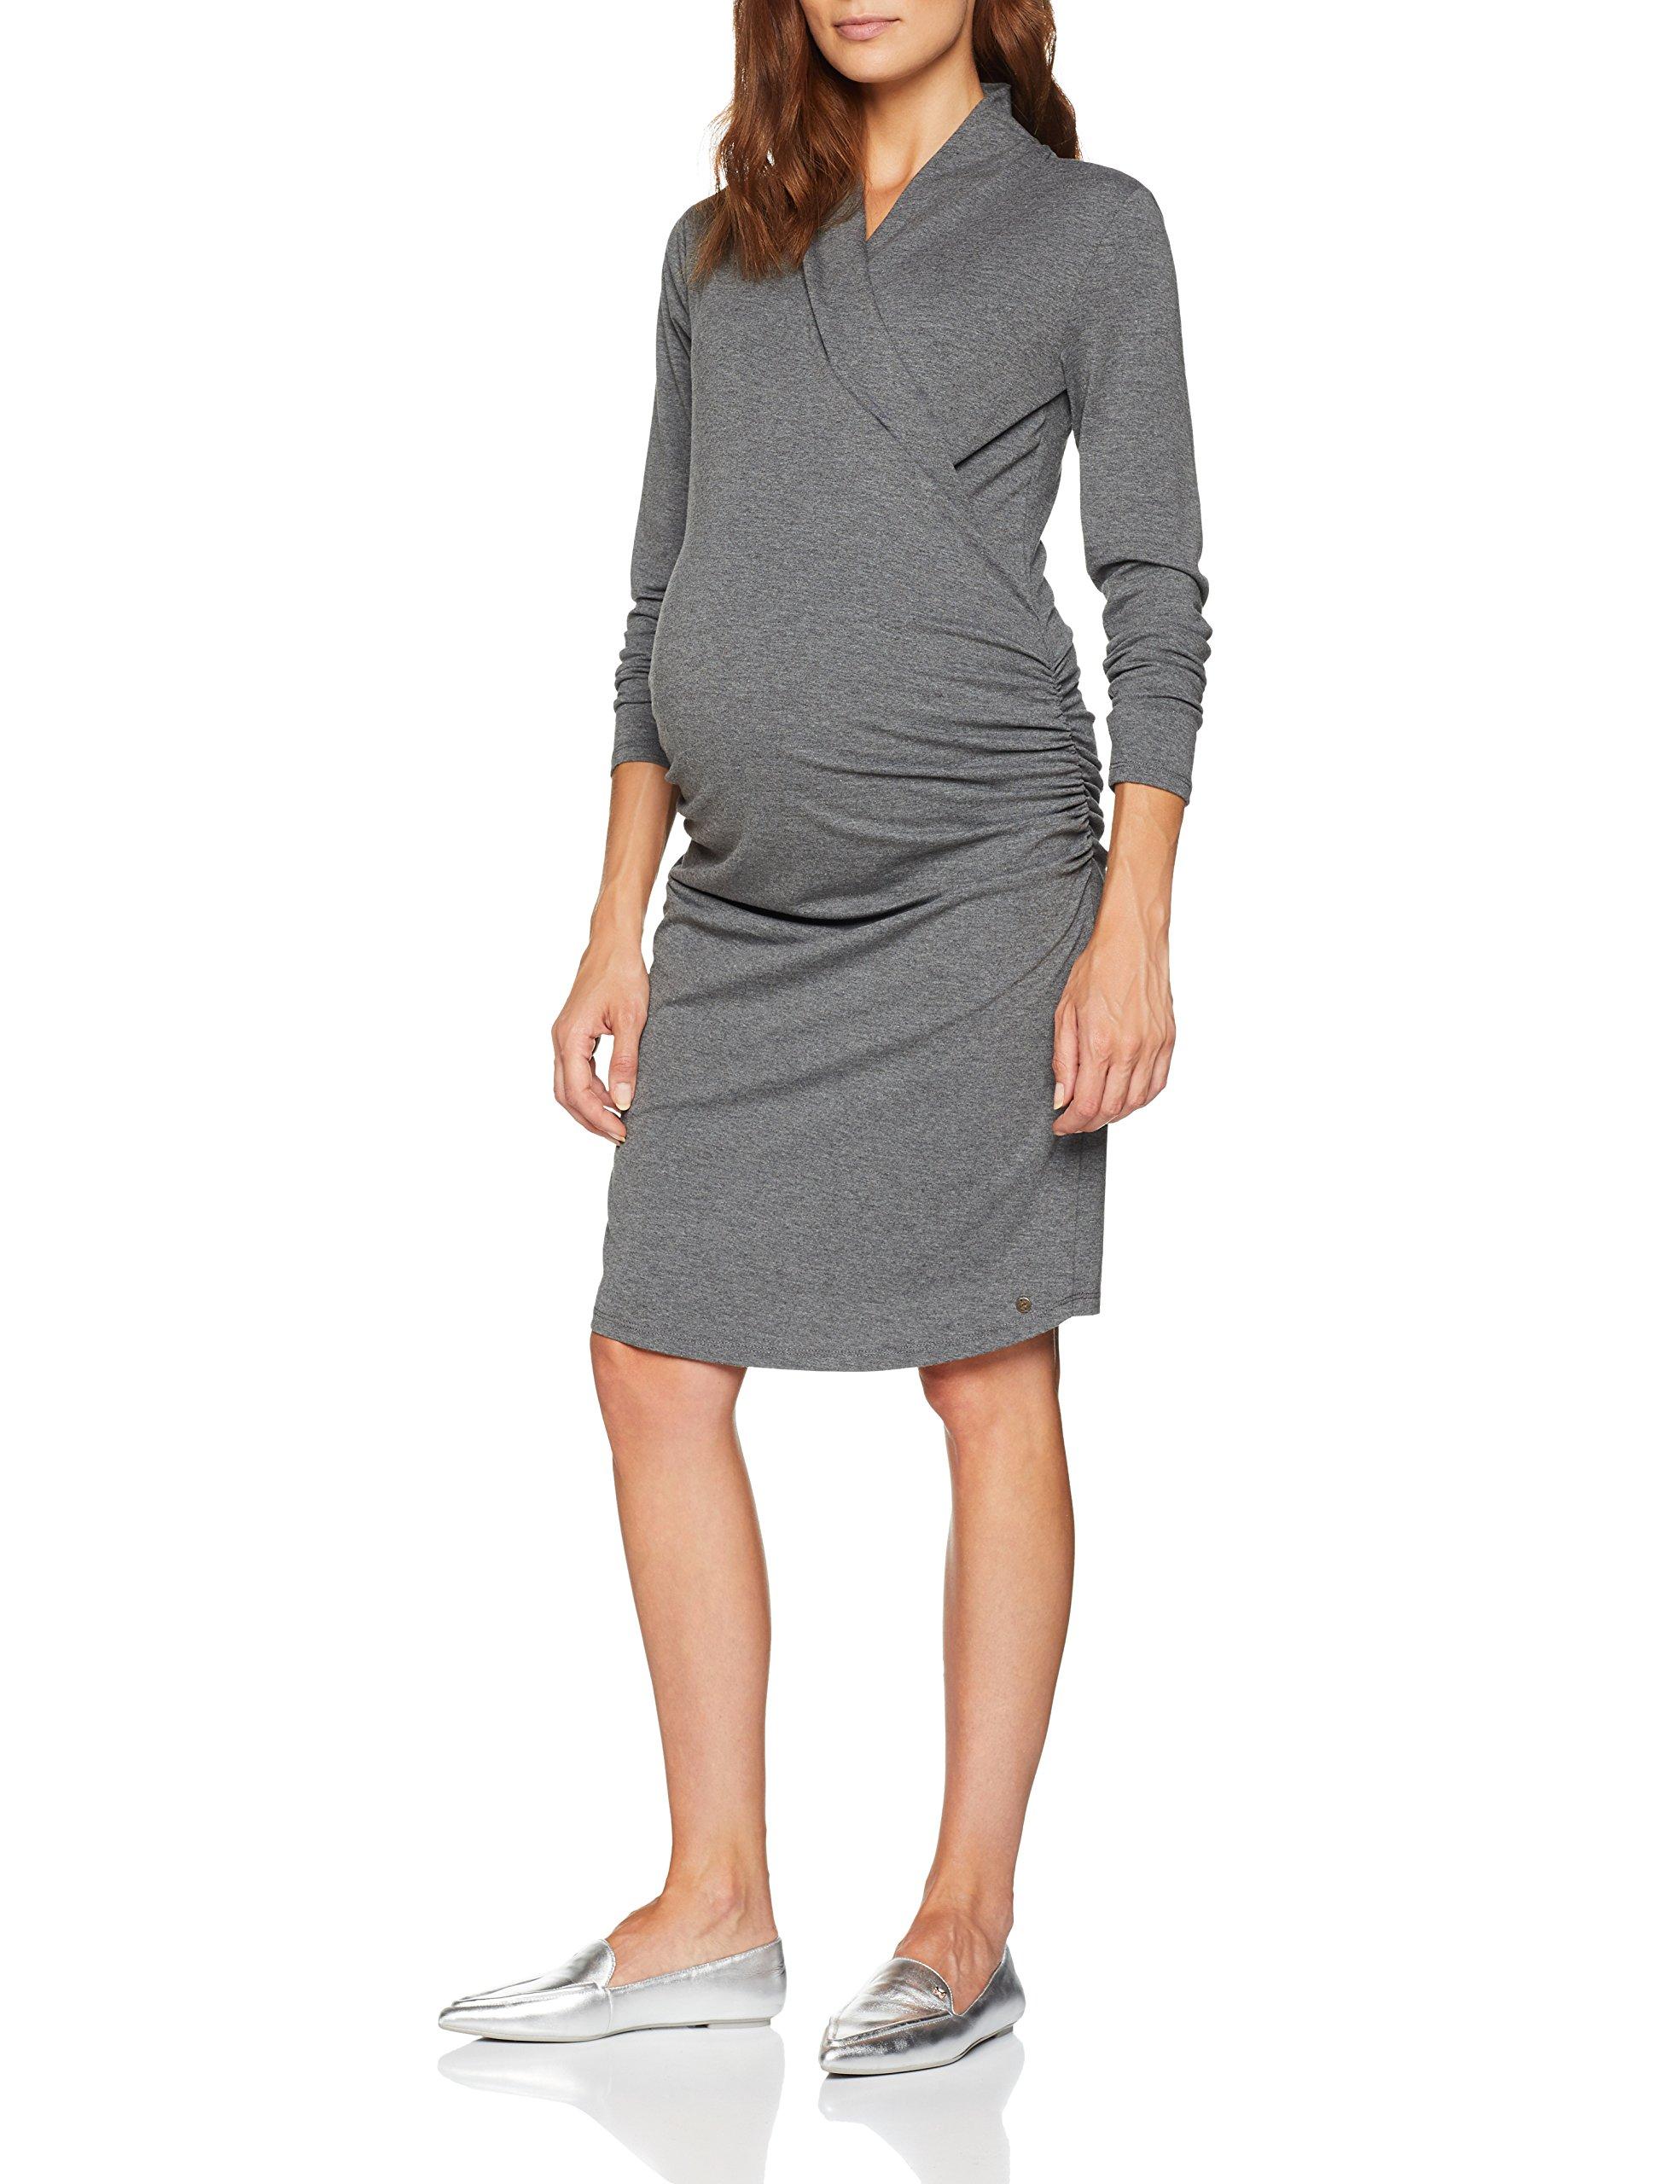 Esprit 00842taille Dress Ls RobeGraudark Grey FabricantLFemme Nursing Maternity Melange 35LjARq4